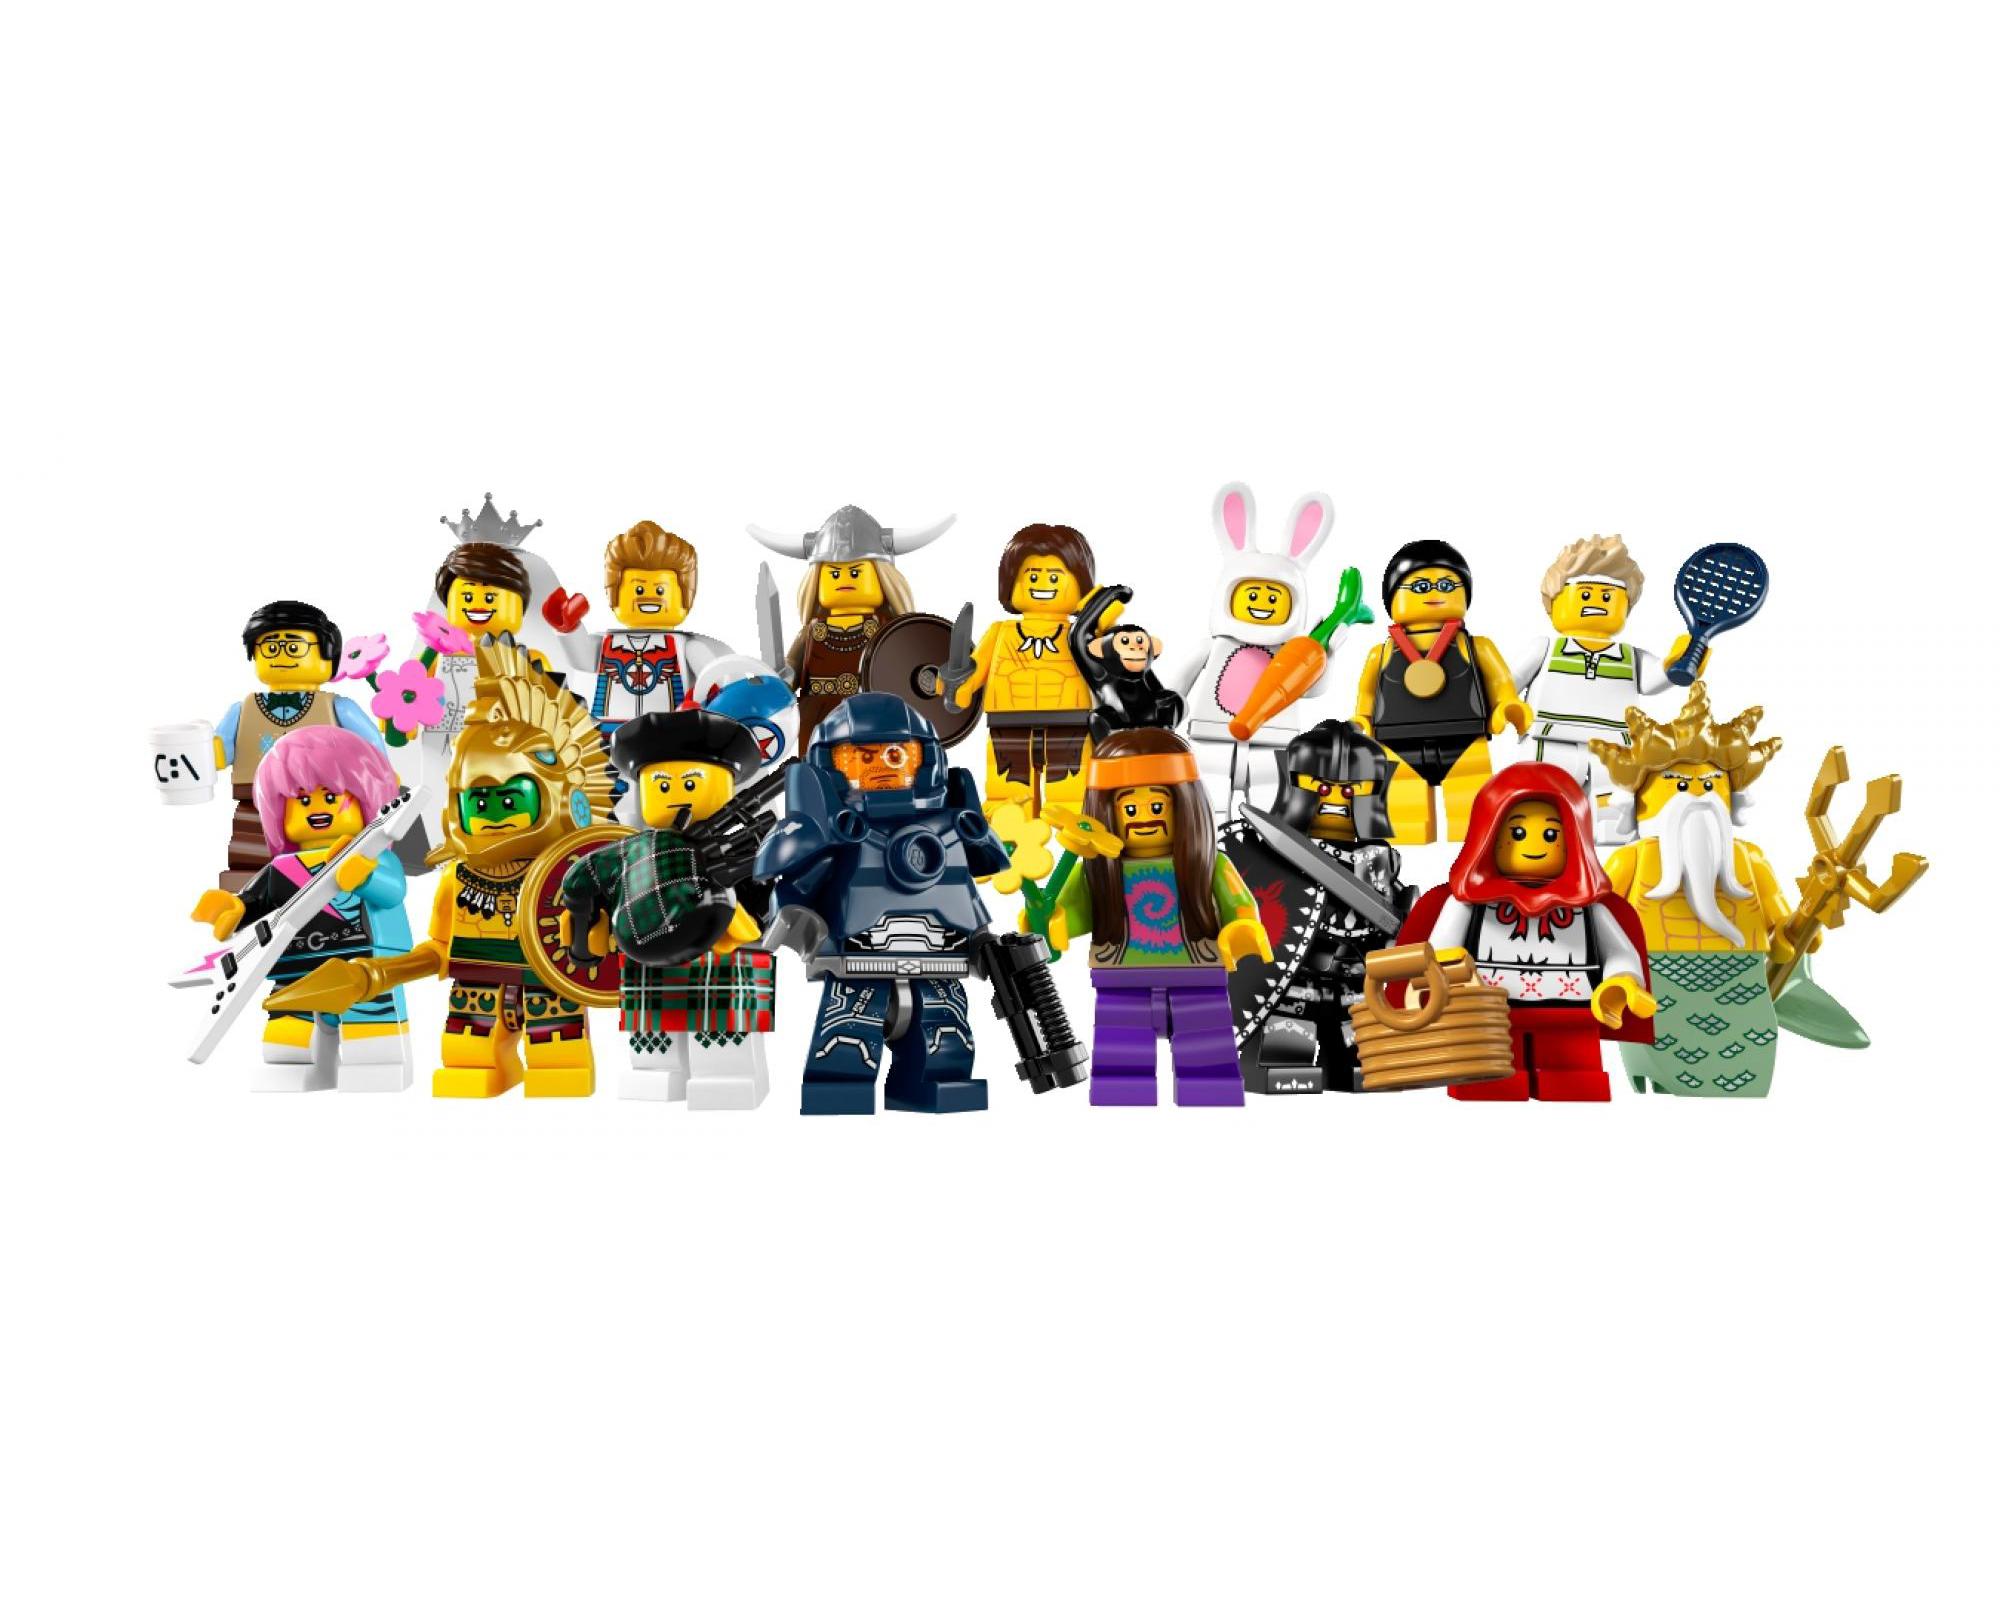 8831 Minifigures Series 7 | Brickipedia | Fandom powered by Wikia